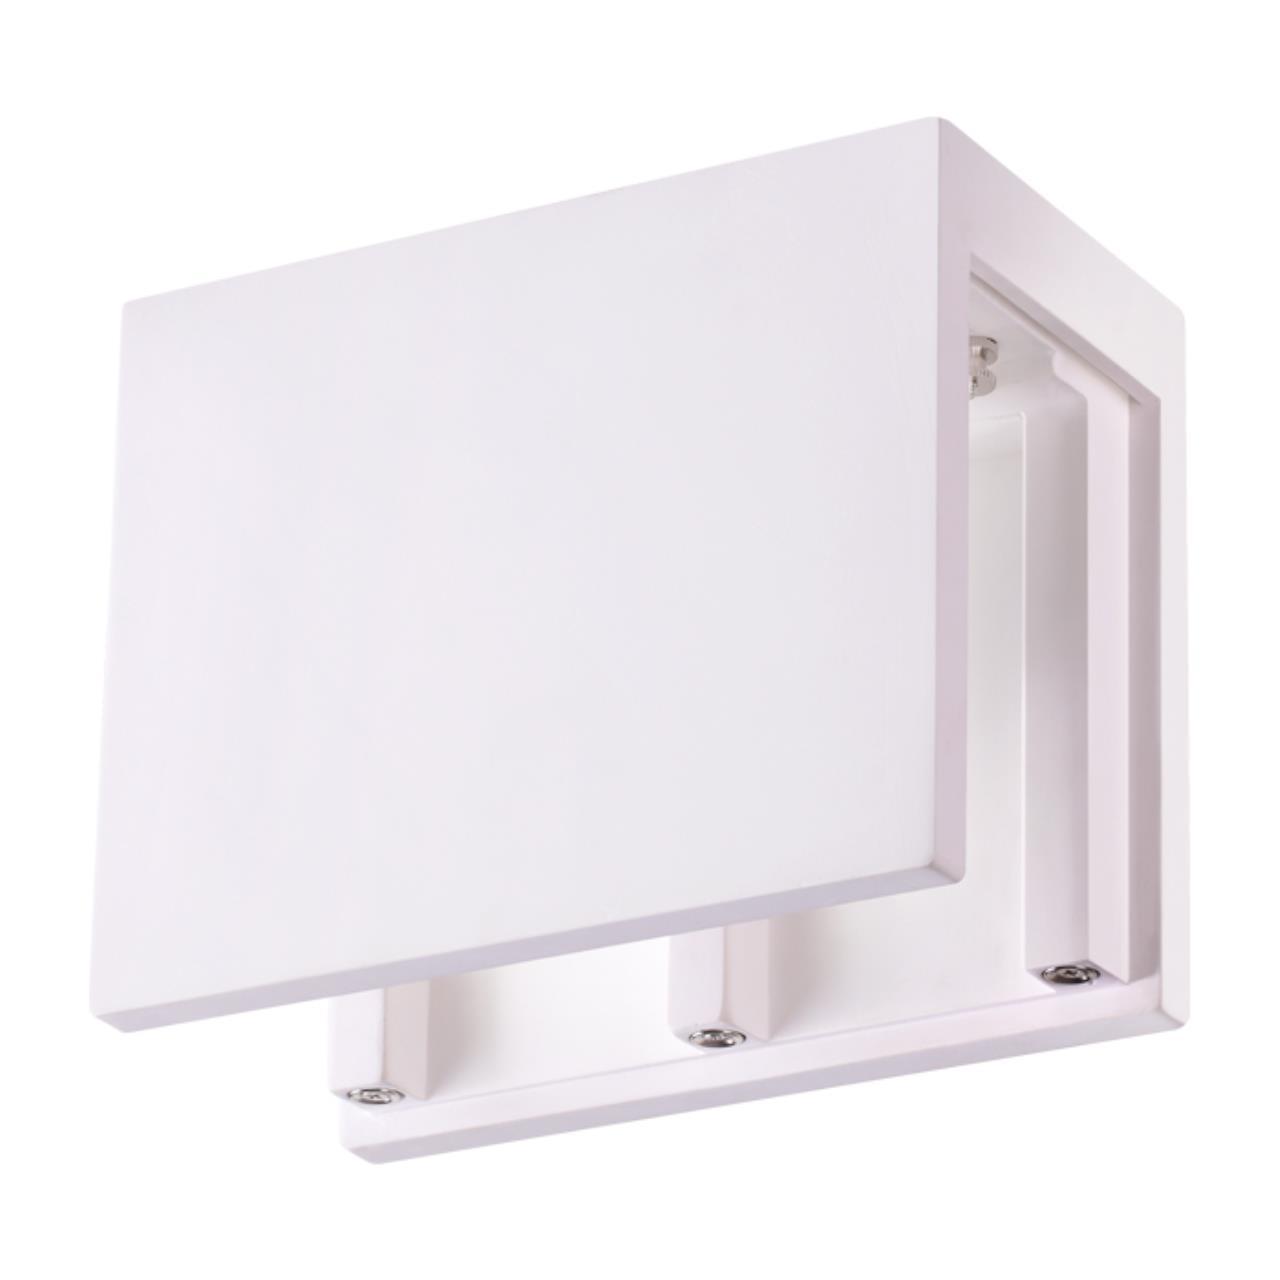 370506 KONST NT19 034 белый Накладной светильник IP20 GU10 2*50W 220-240V LEGIO